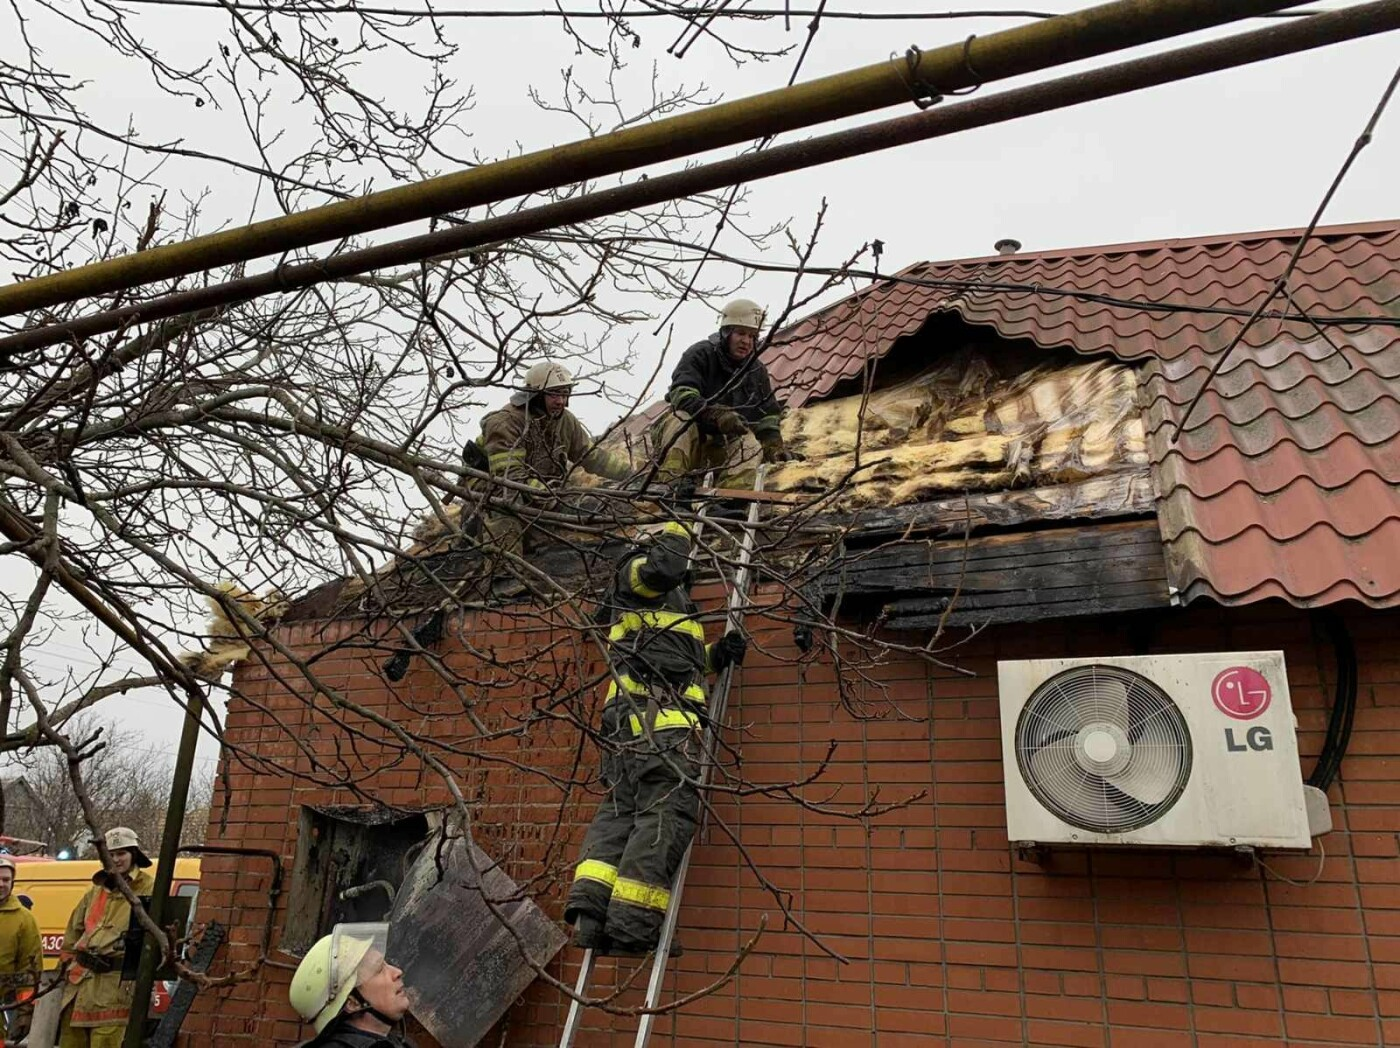 В Мелитополе при пожаре пострадал человек, - ФОТО, фото-1